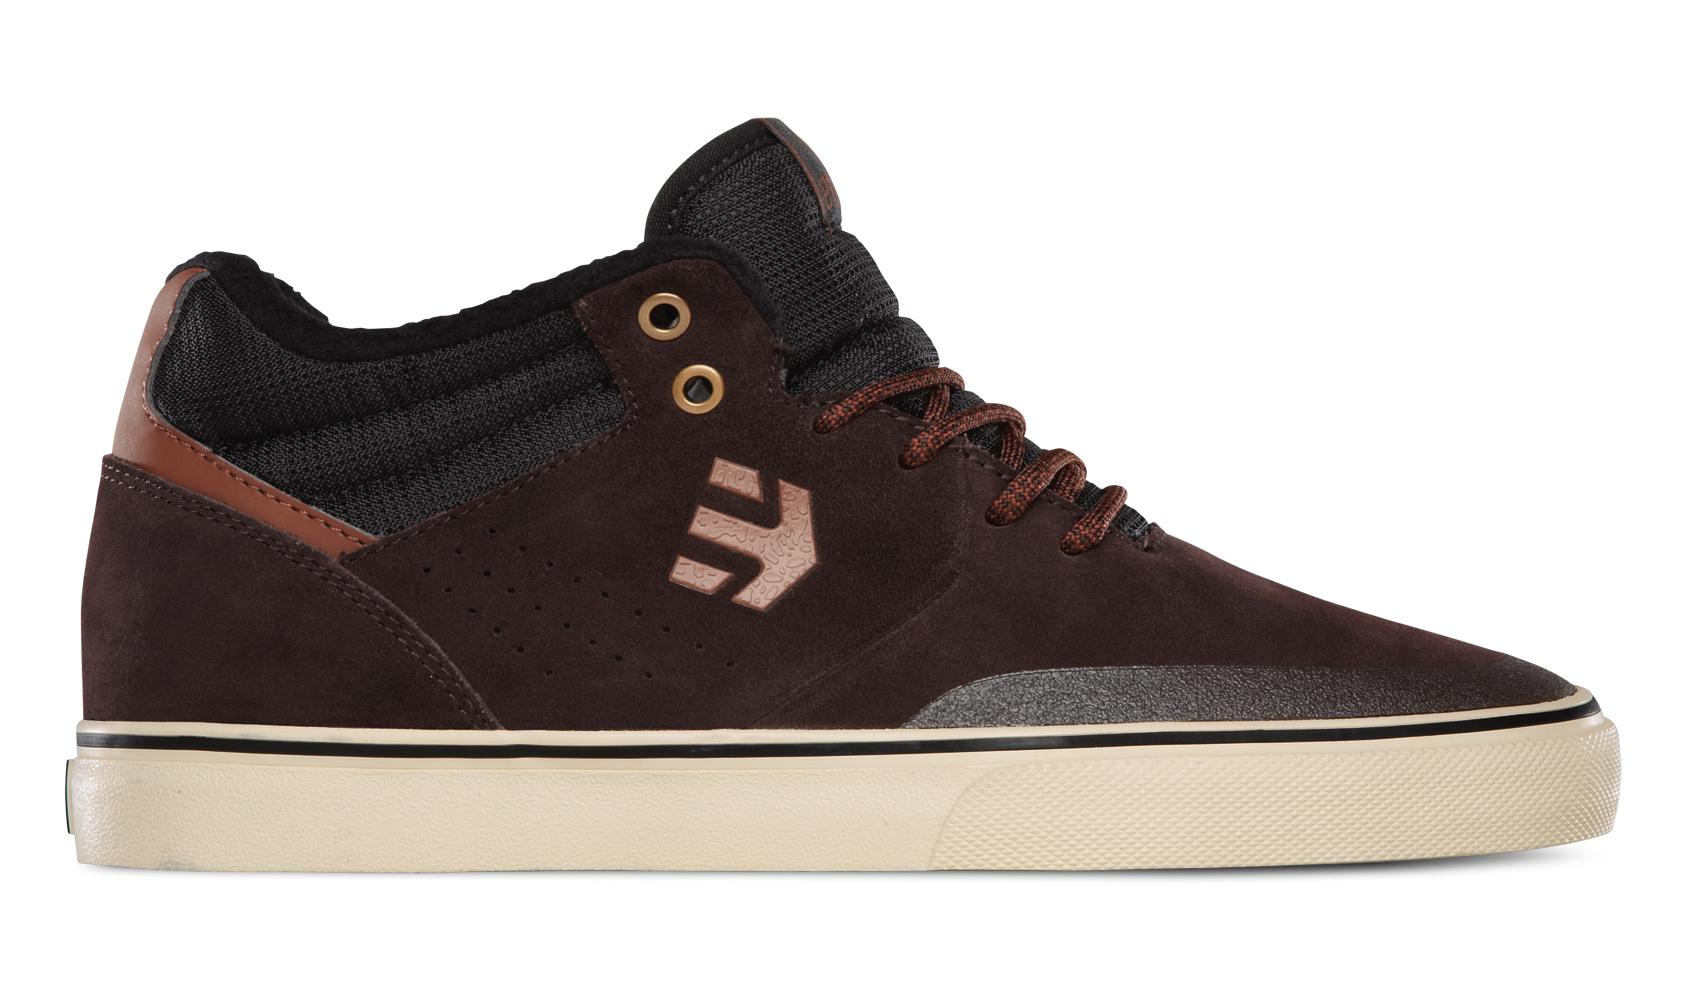 54c505eb00 Etnies Marana Vulc MT Skate Shoes Mid Top